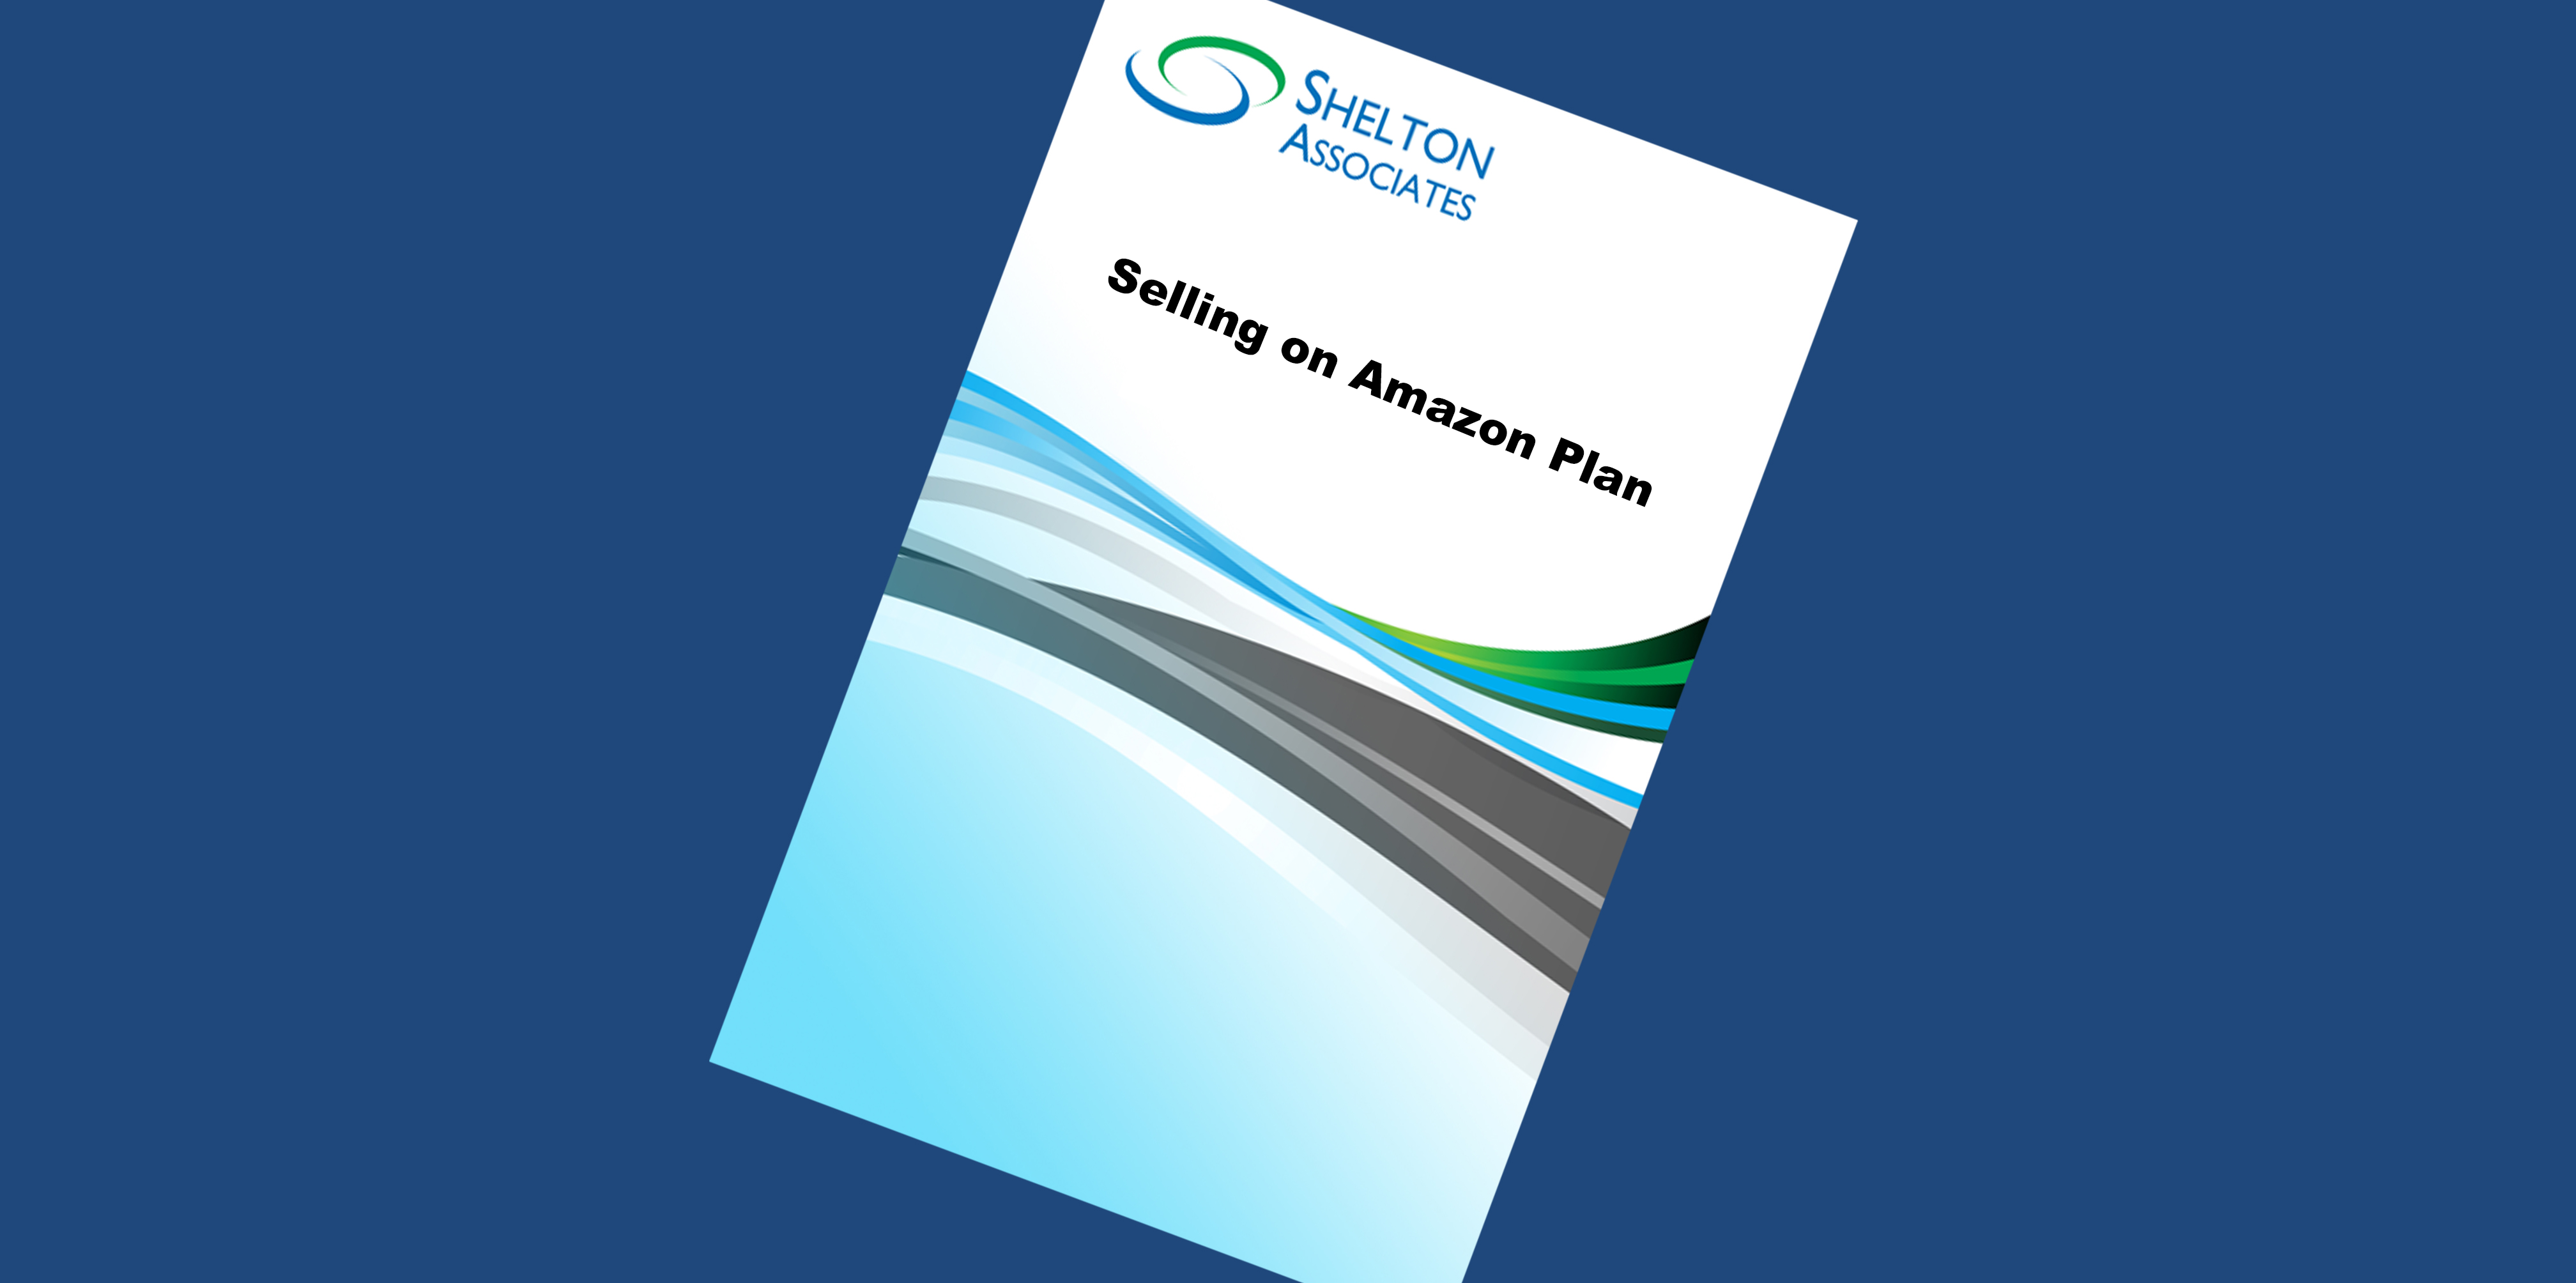 Selling-On-Amazon-Plan